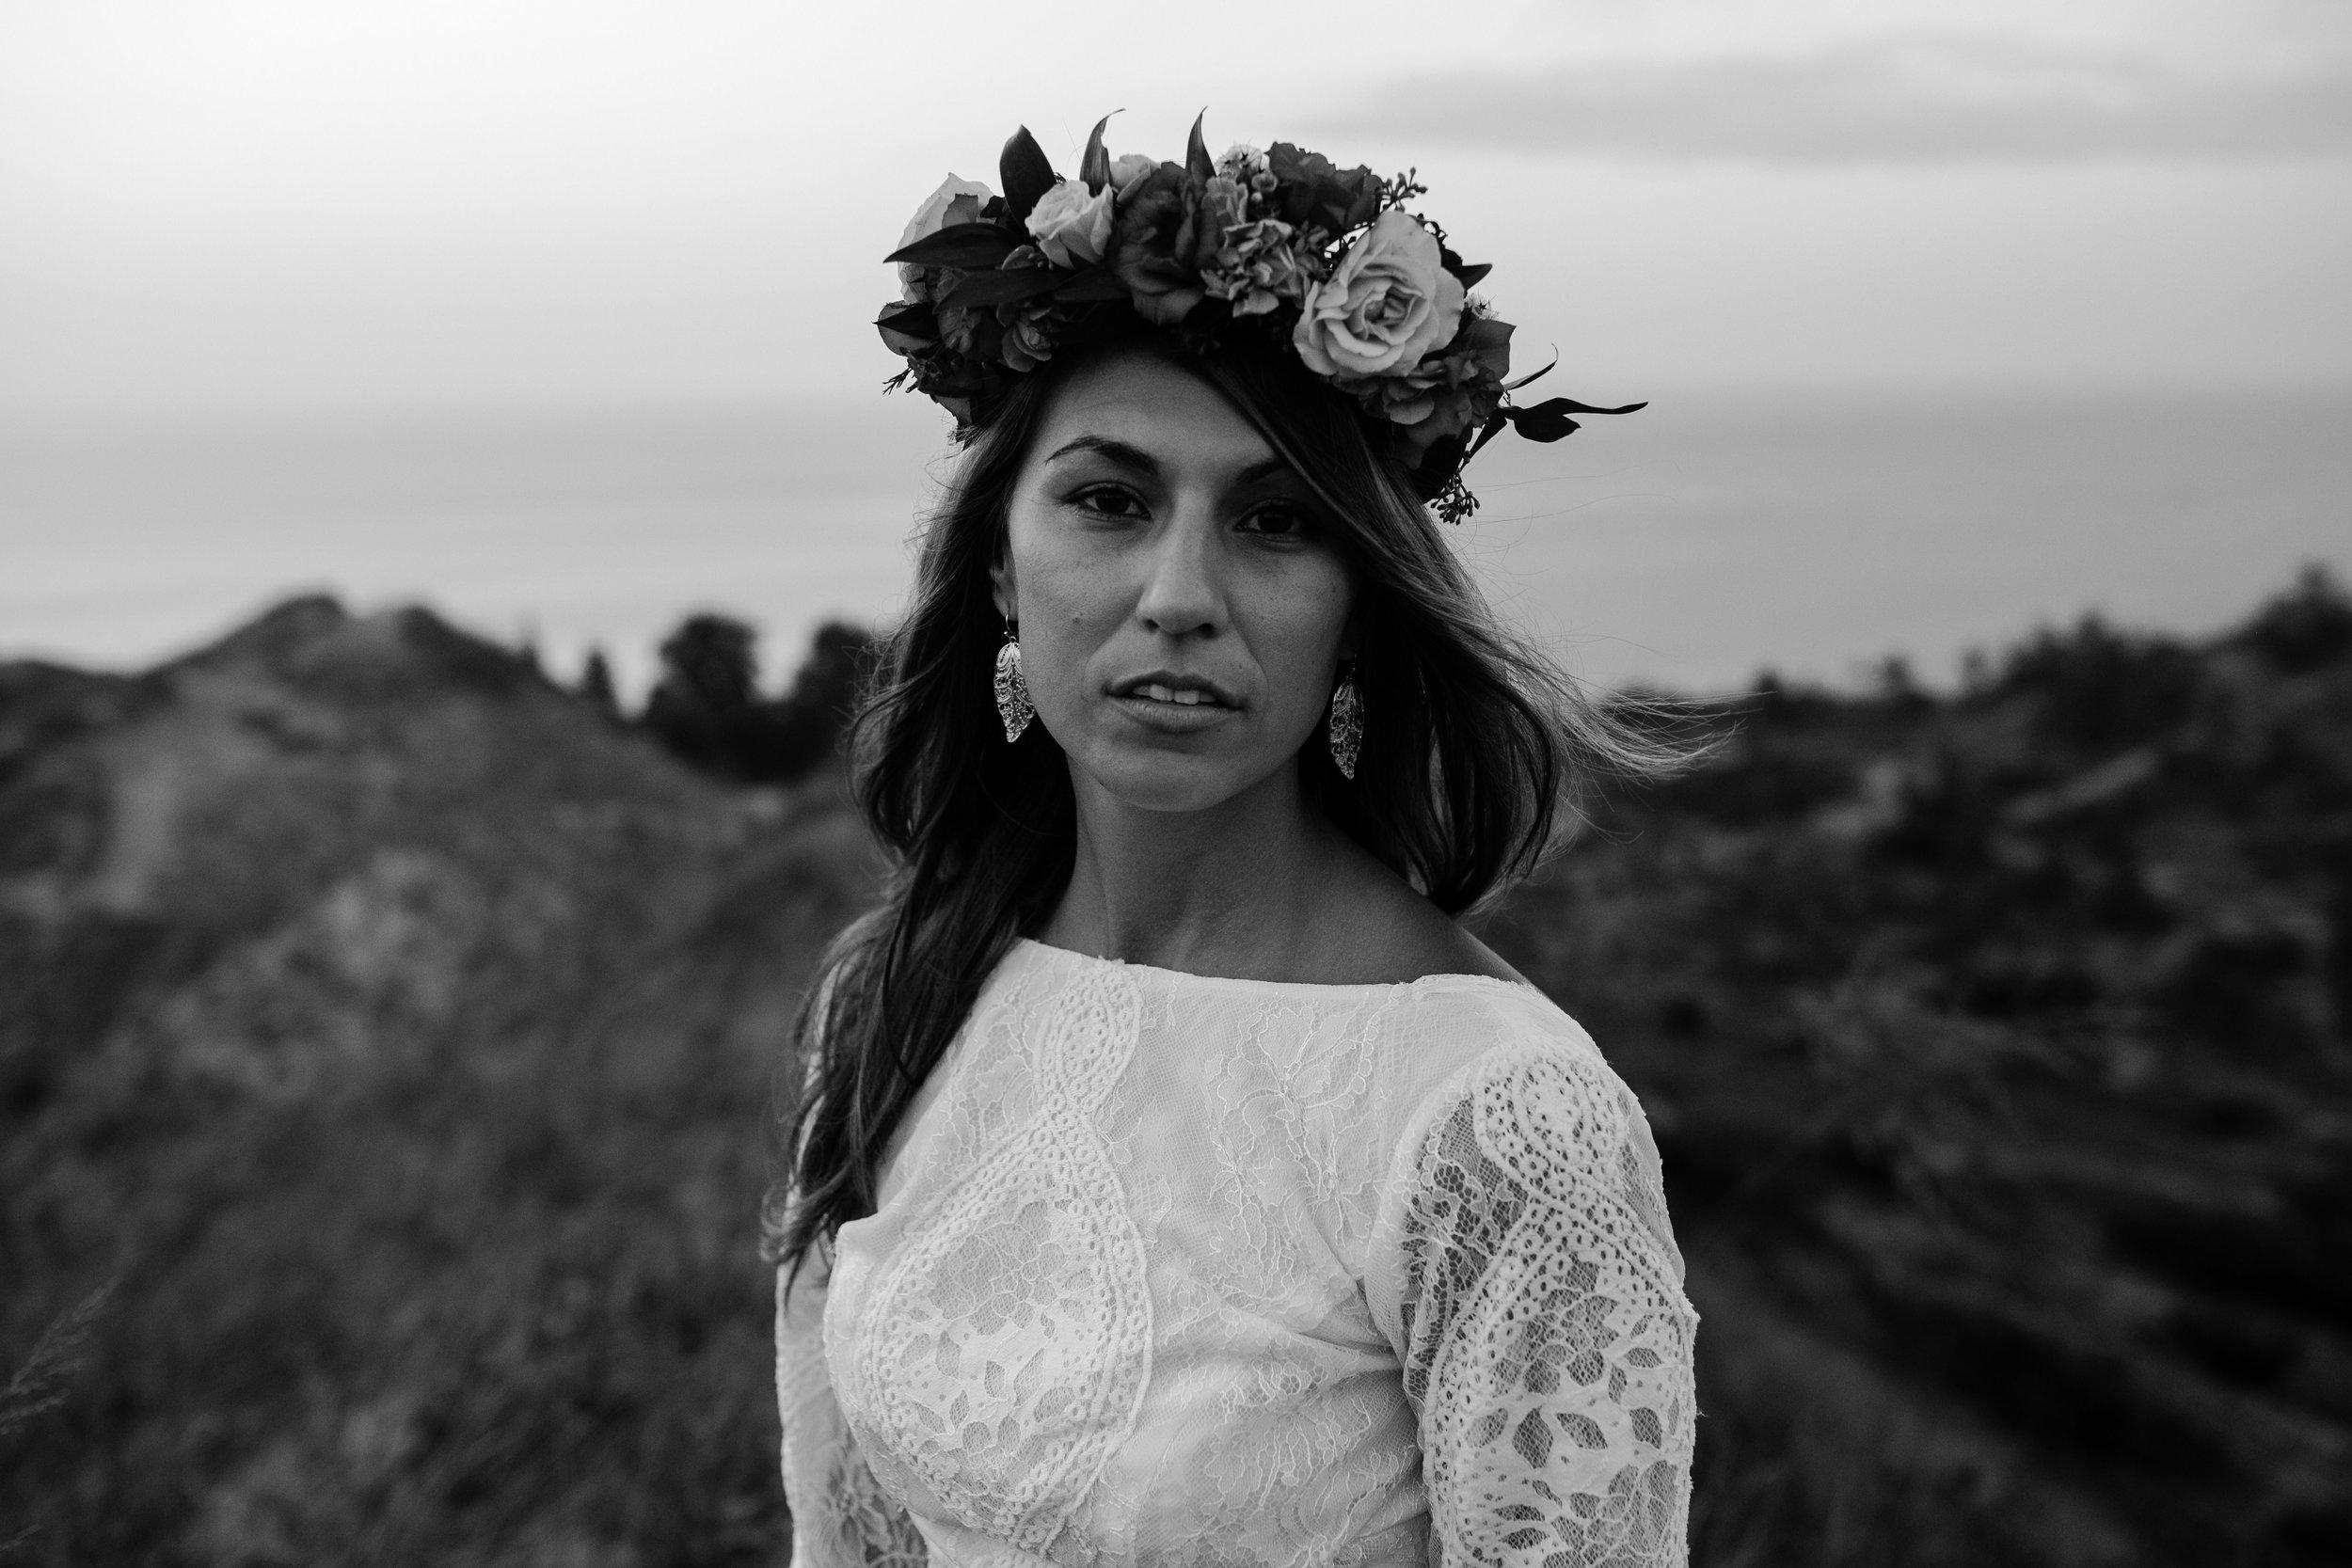 michigan-emotive-photographer-moonlight-elopement-mariha-hunter-161.jpg